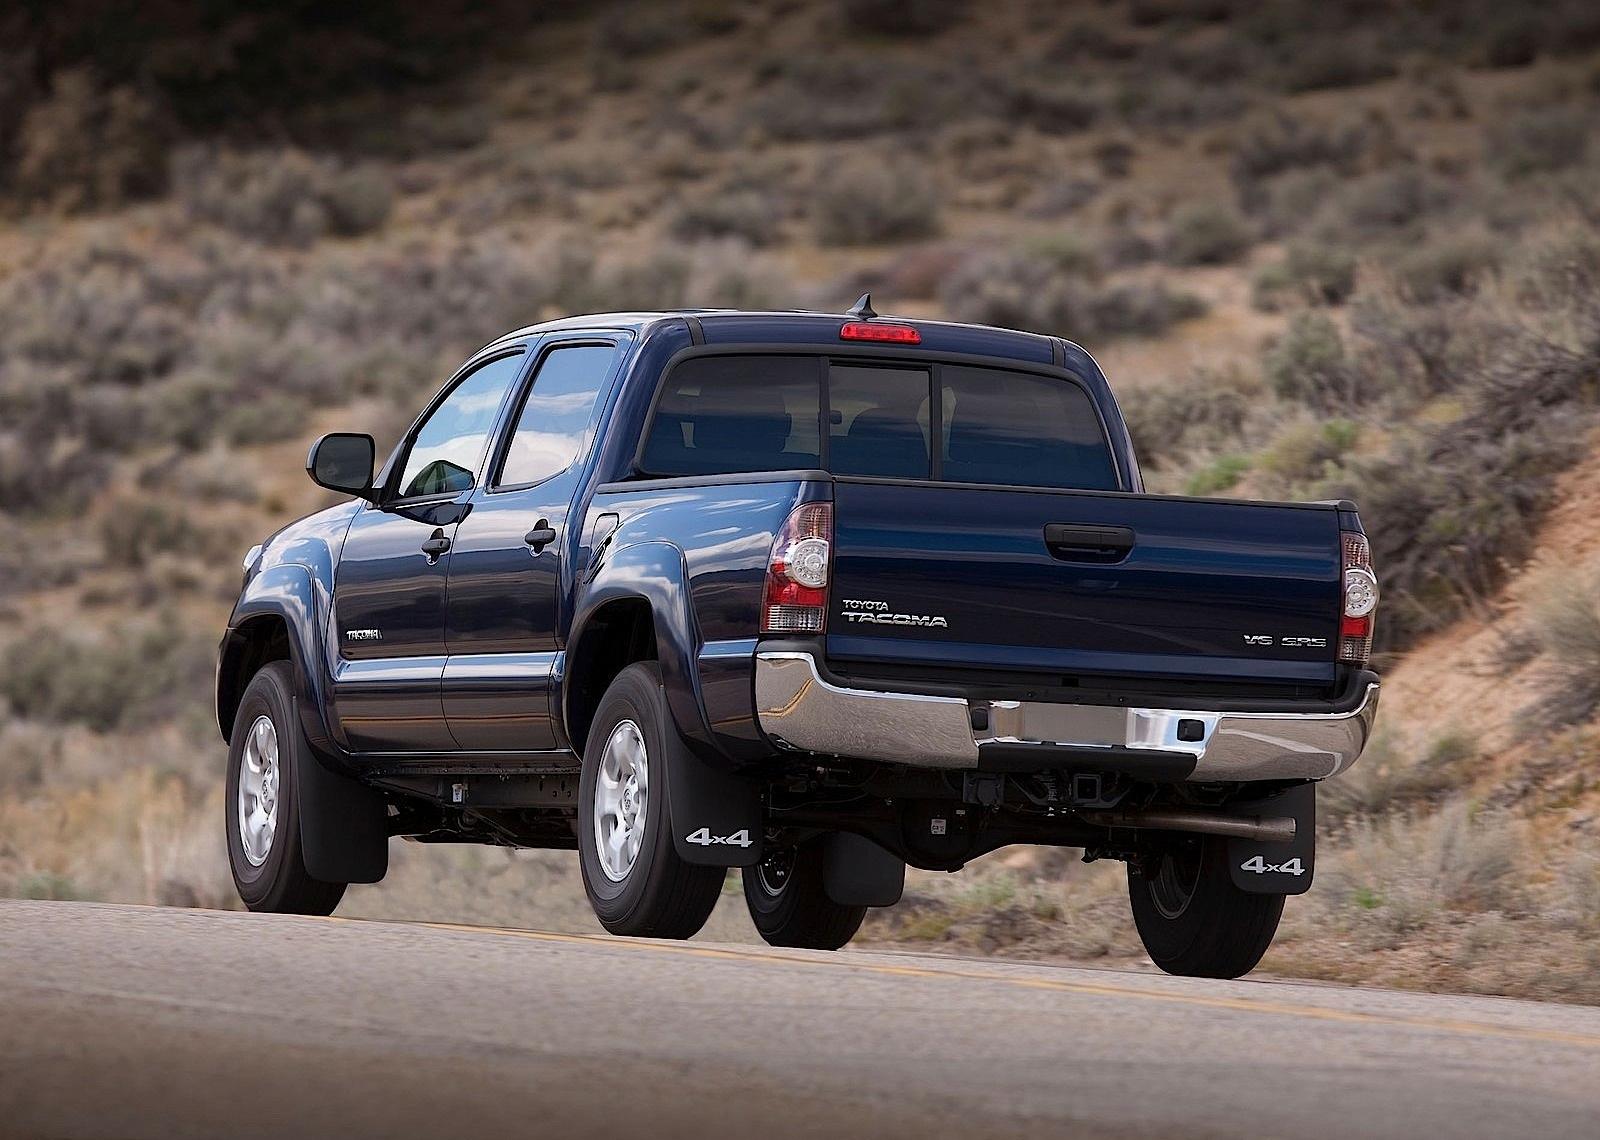 2013 Toyota Tacoma 2.7 >> TOYOTA Tacoma Double Cab specs - 2011, 2012, 2013, 2014, 2015 - autoevolution